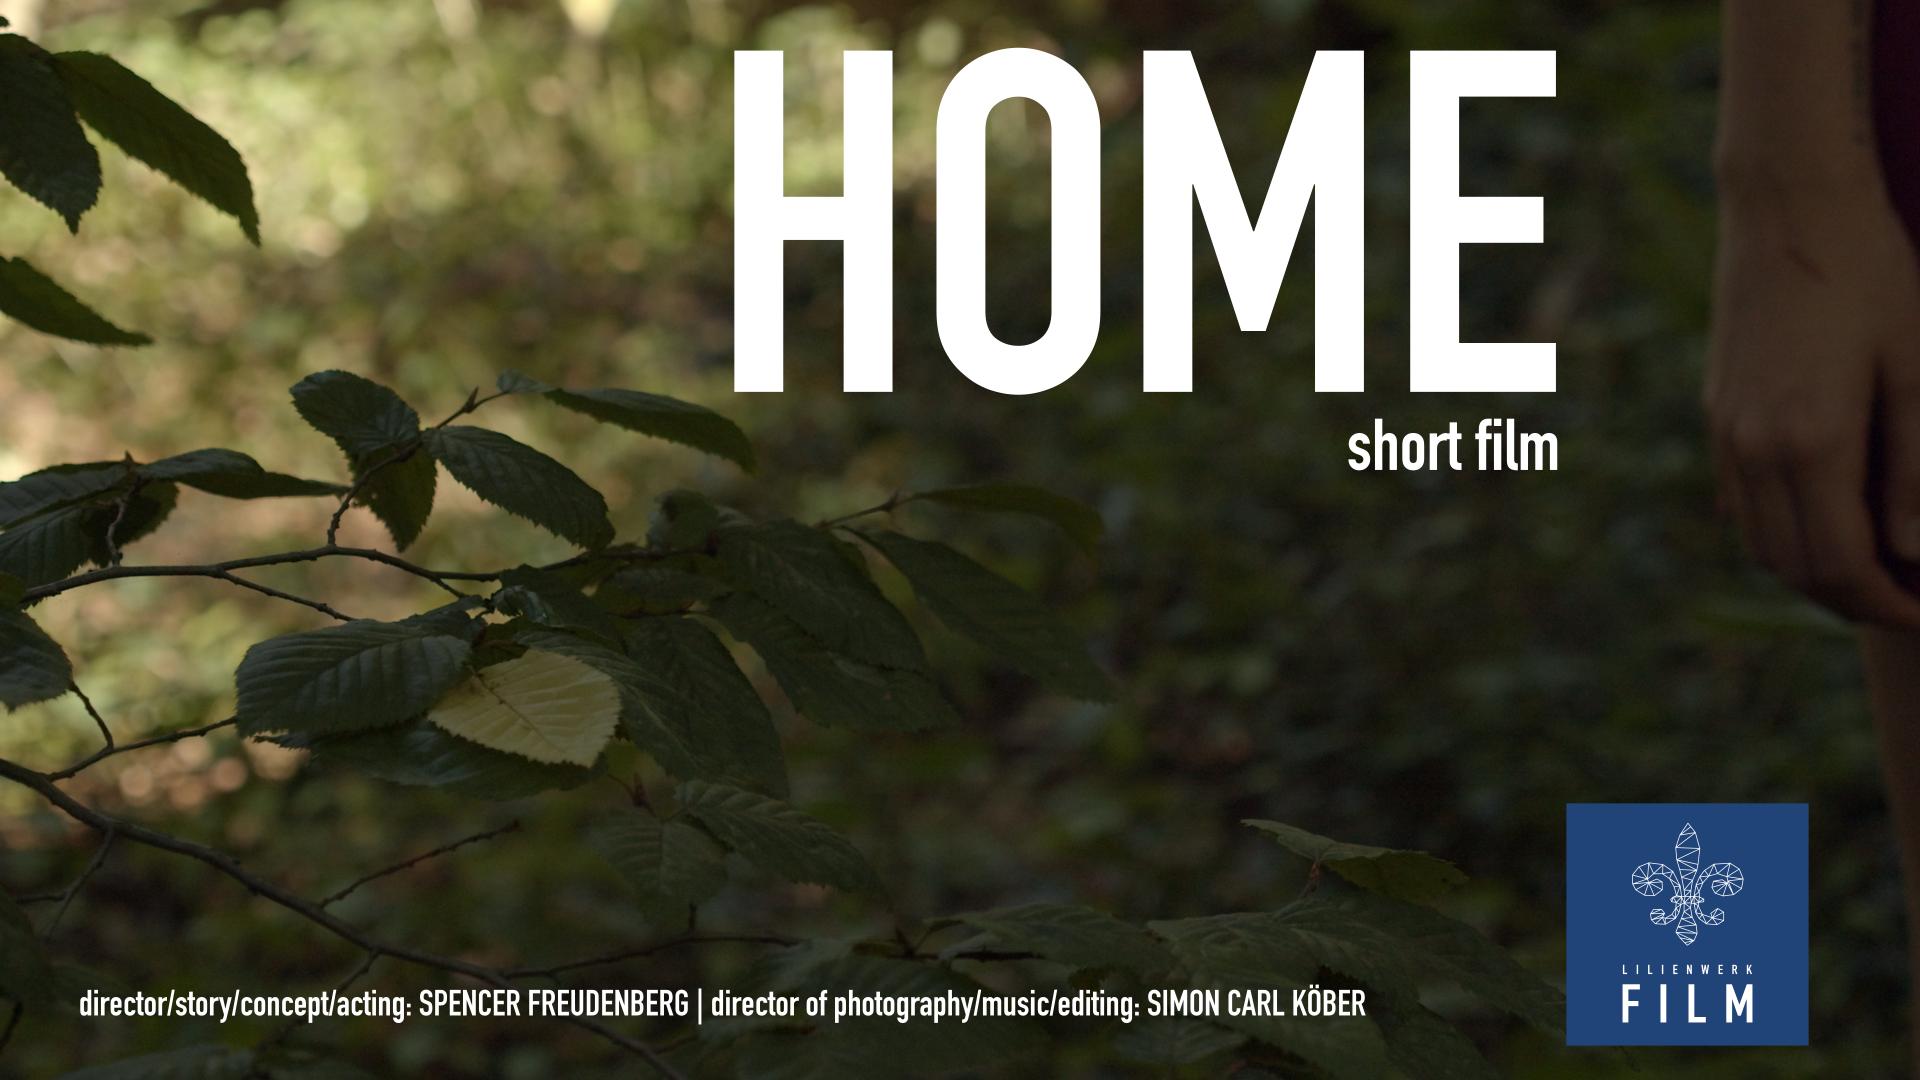 Thumbnail-Home_1080.png